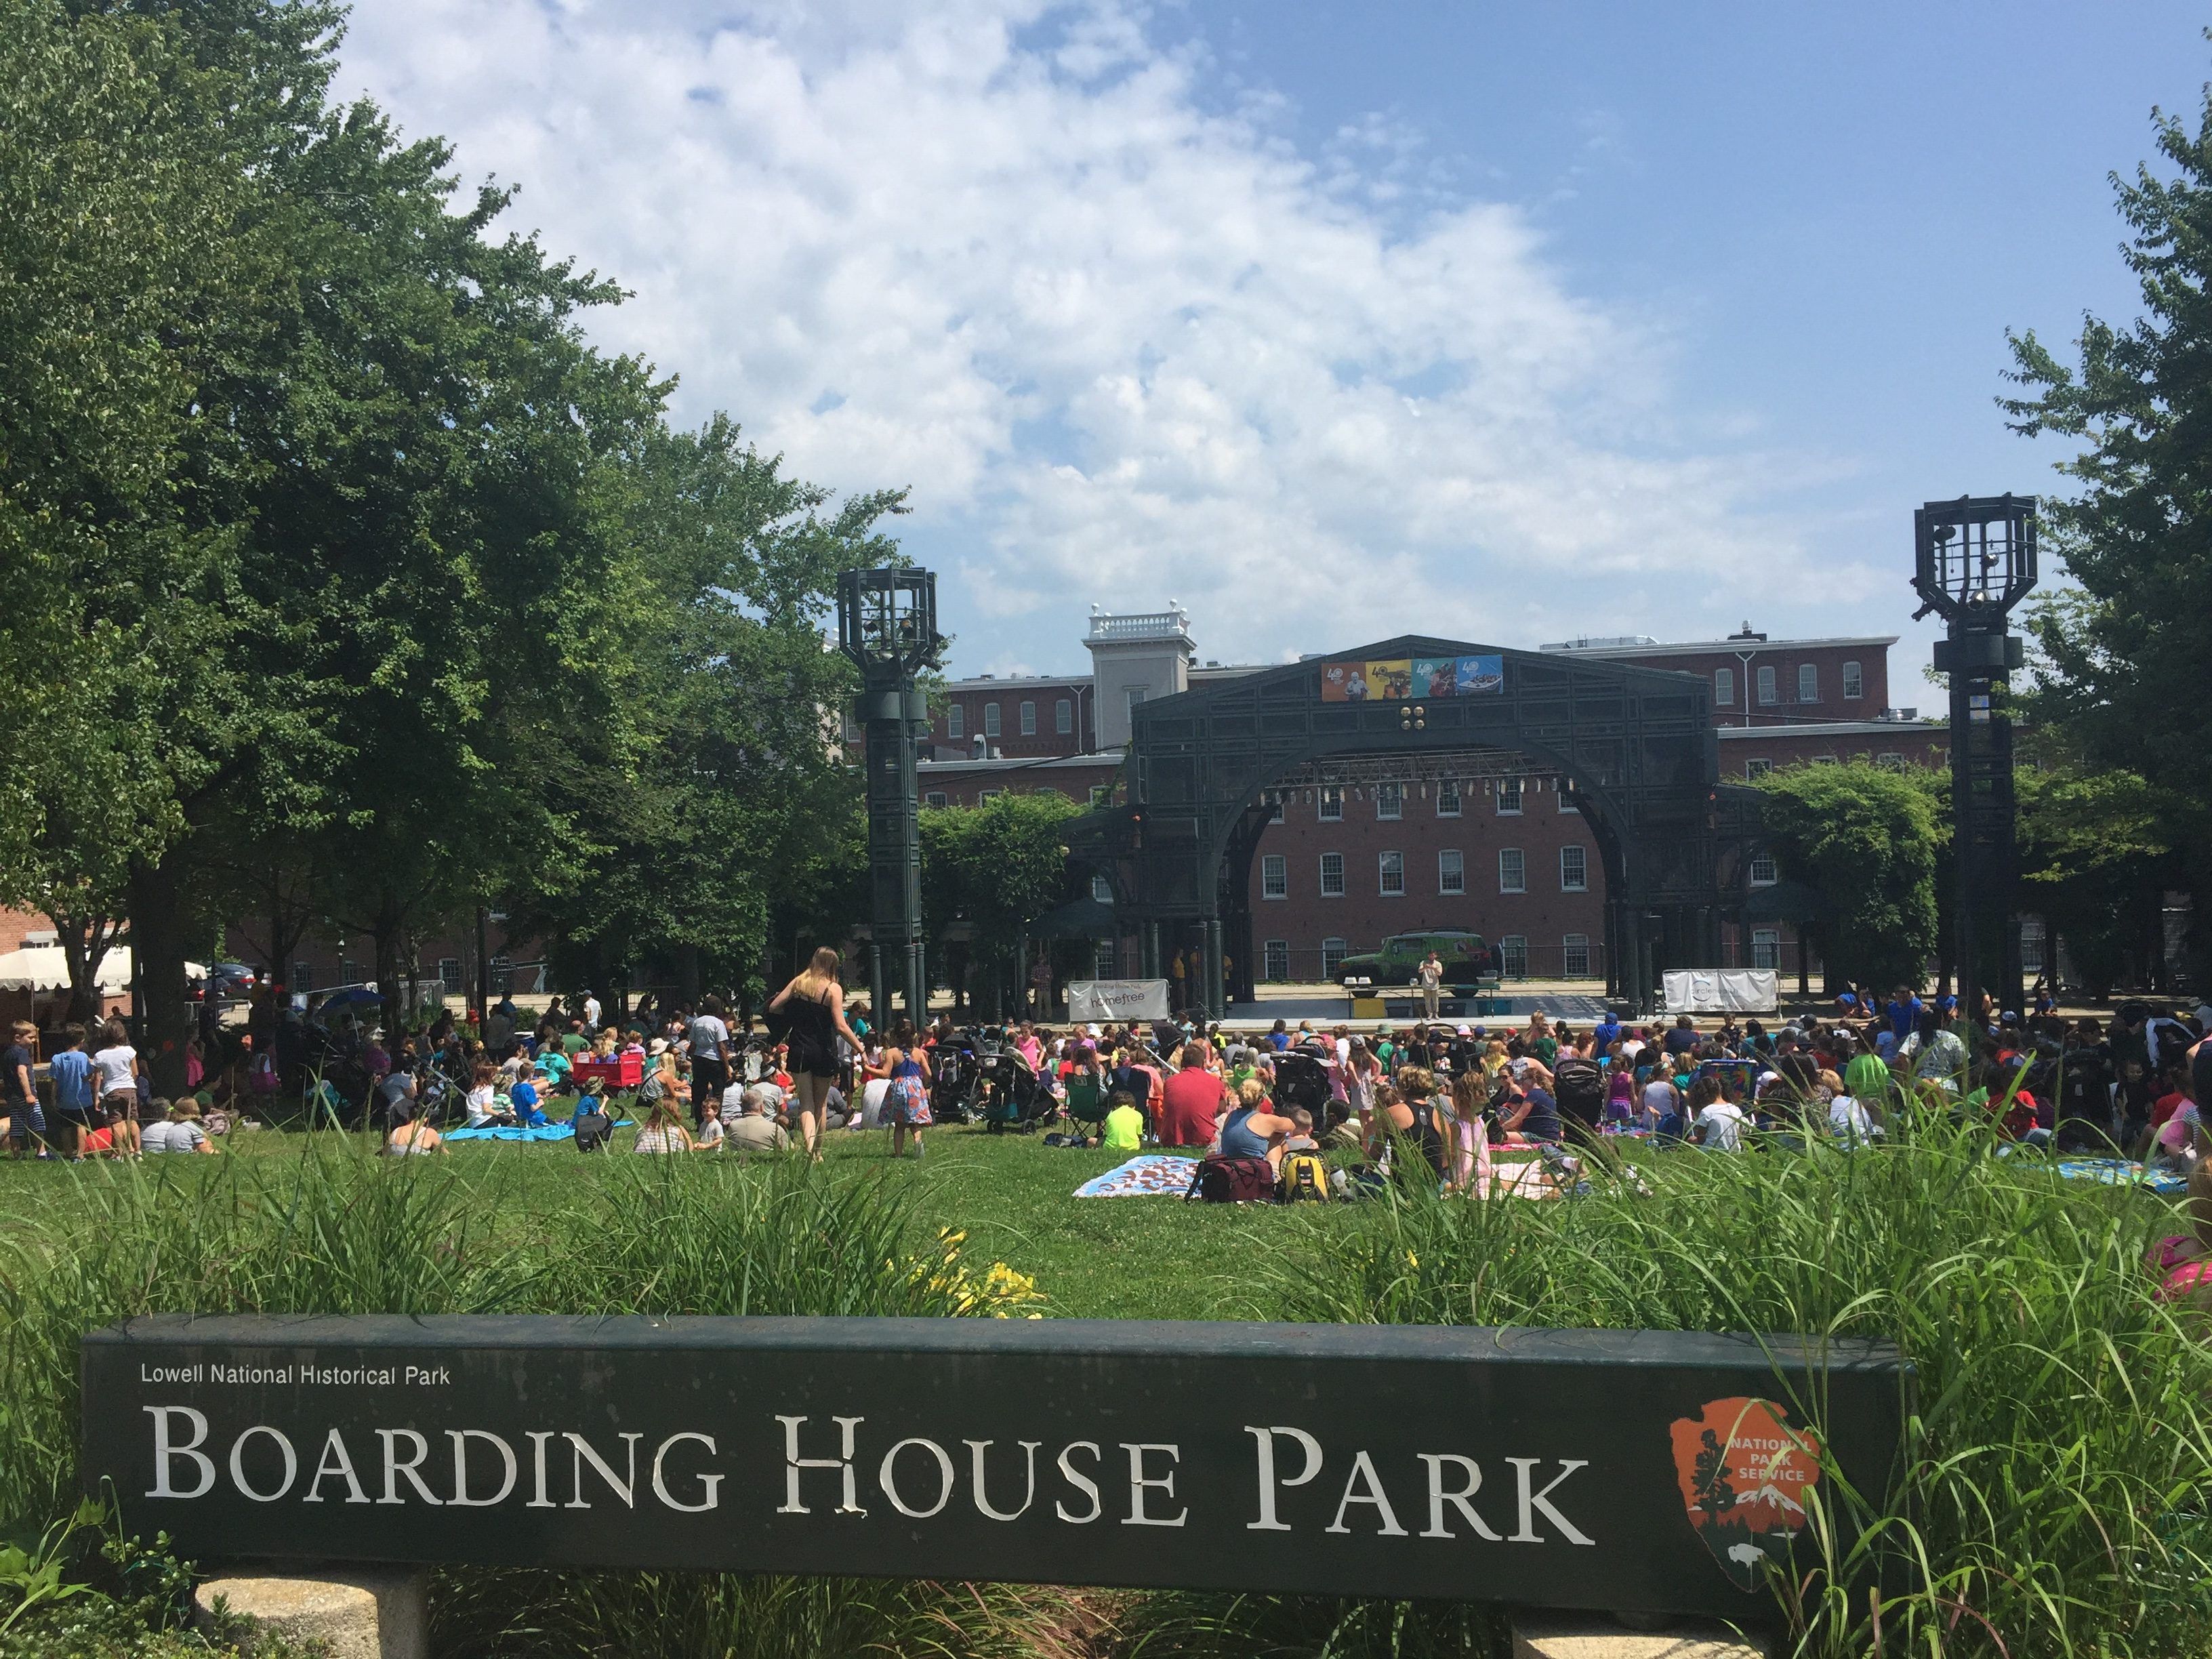 Boarding House Park